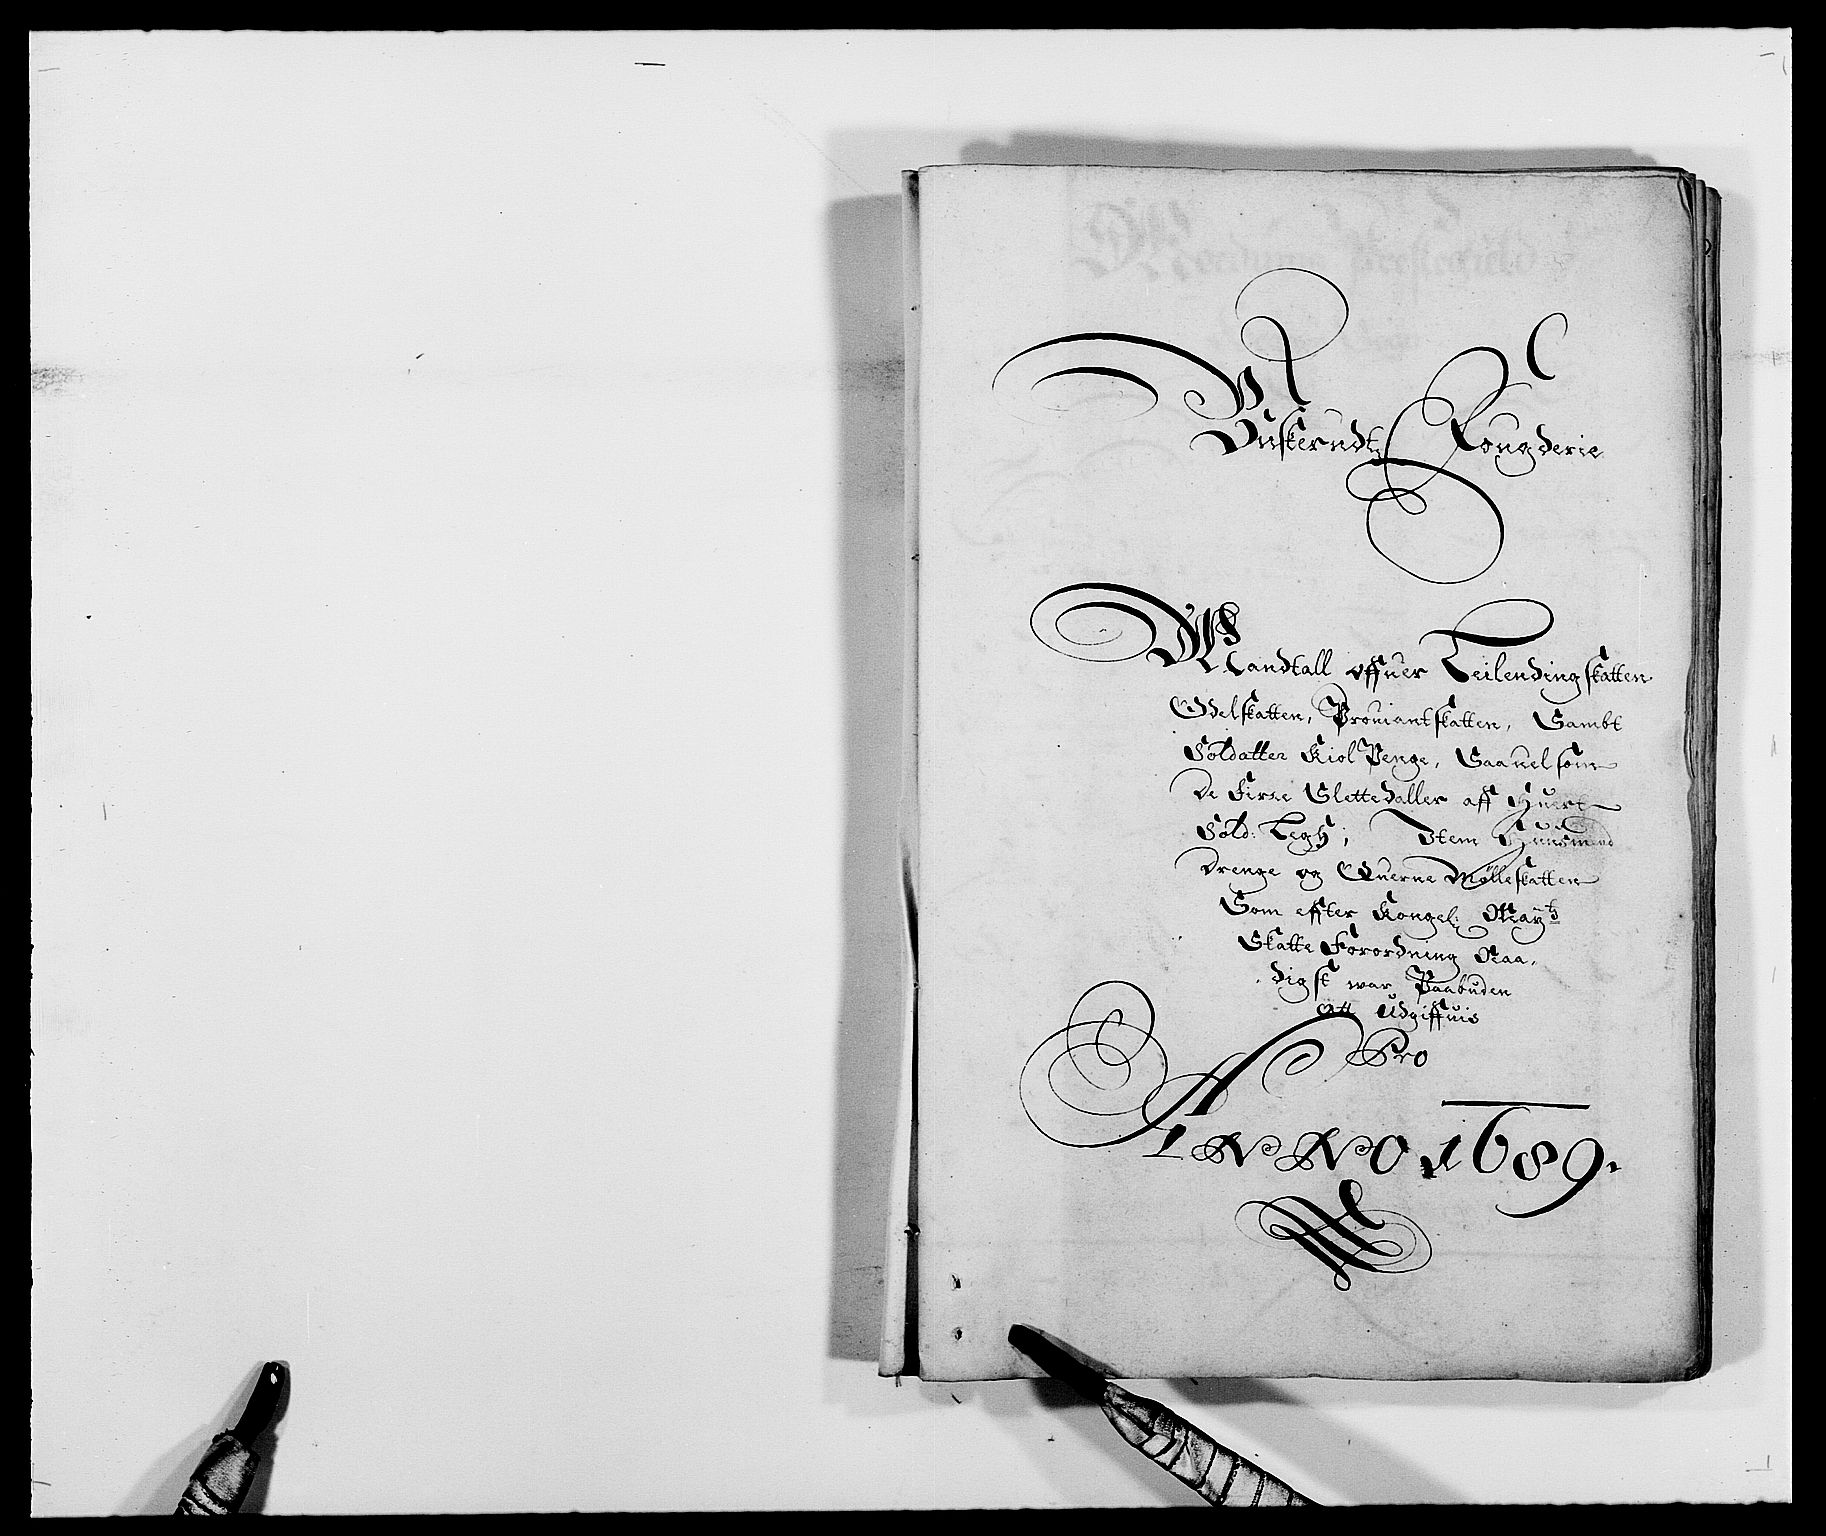 RA, Rentekammeret inntil 1814, Reviderte regnskaper, Fogderegnskap, R25/L1680: Fogderegnskap Buskerud, 1689-1690, s. 58